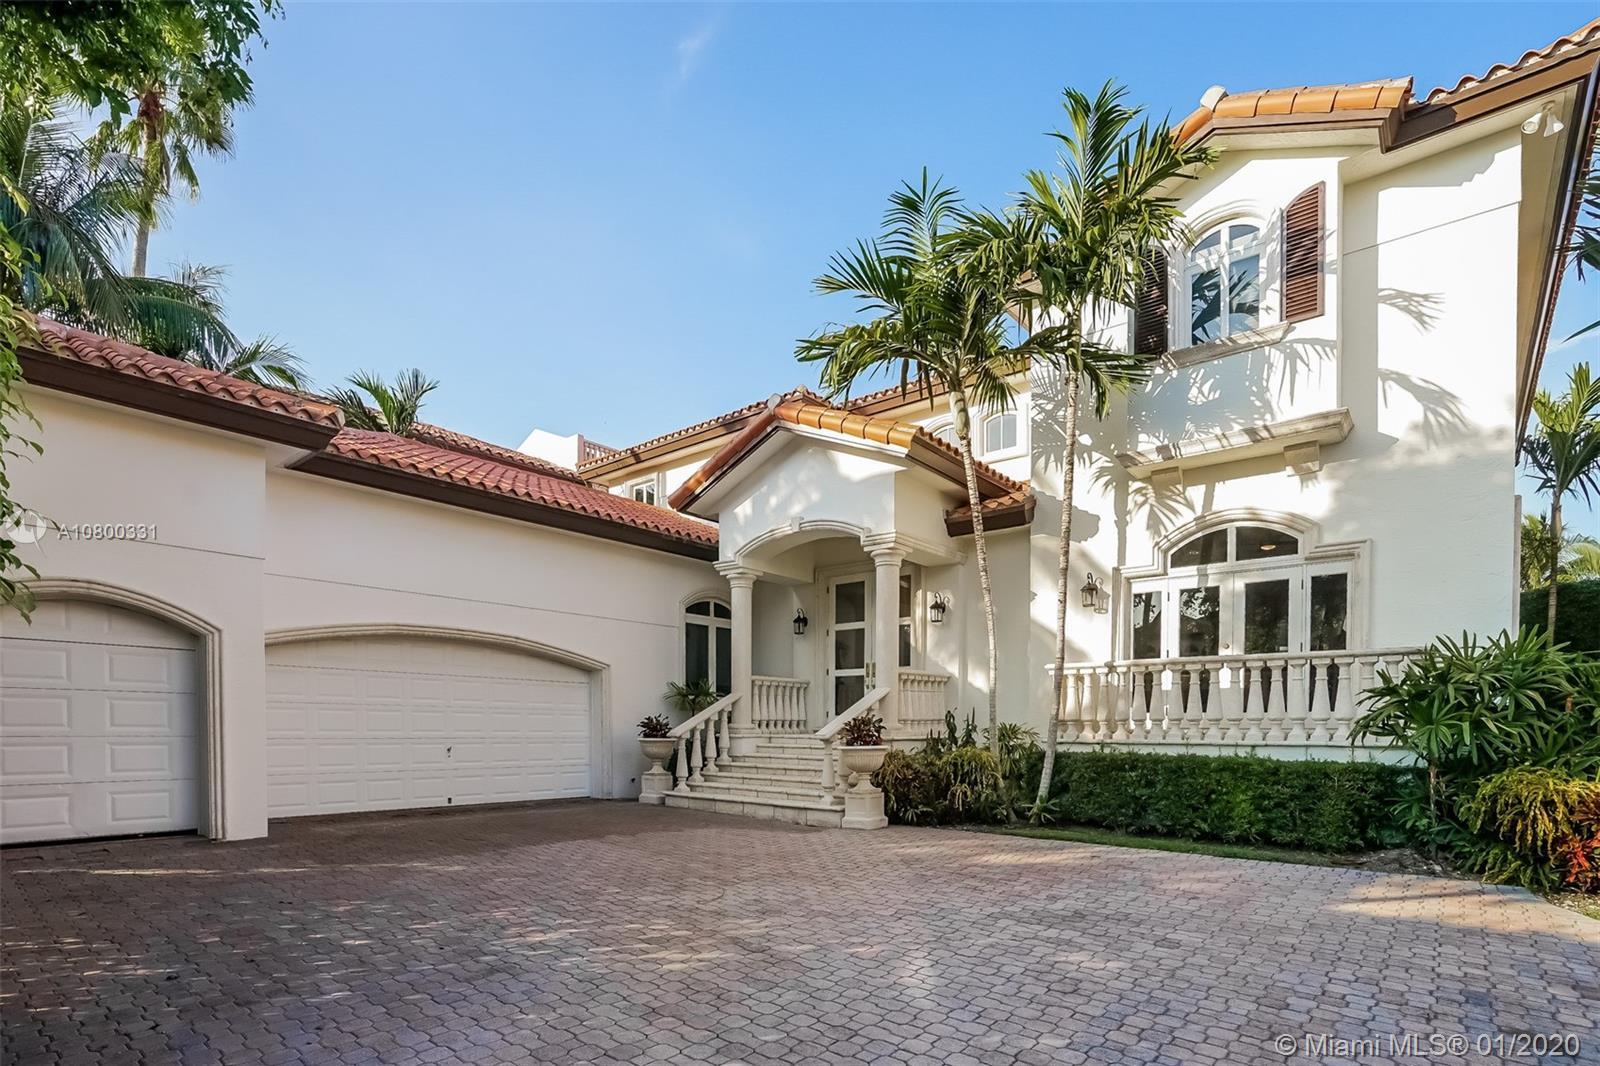 Property for sale at 13663 Deering Bay Dr, Coral Gables,  Florida 33158